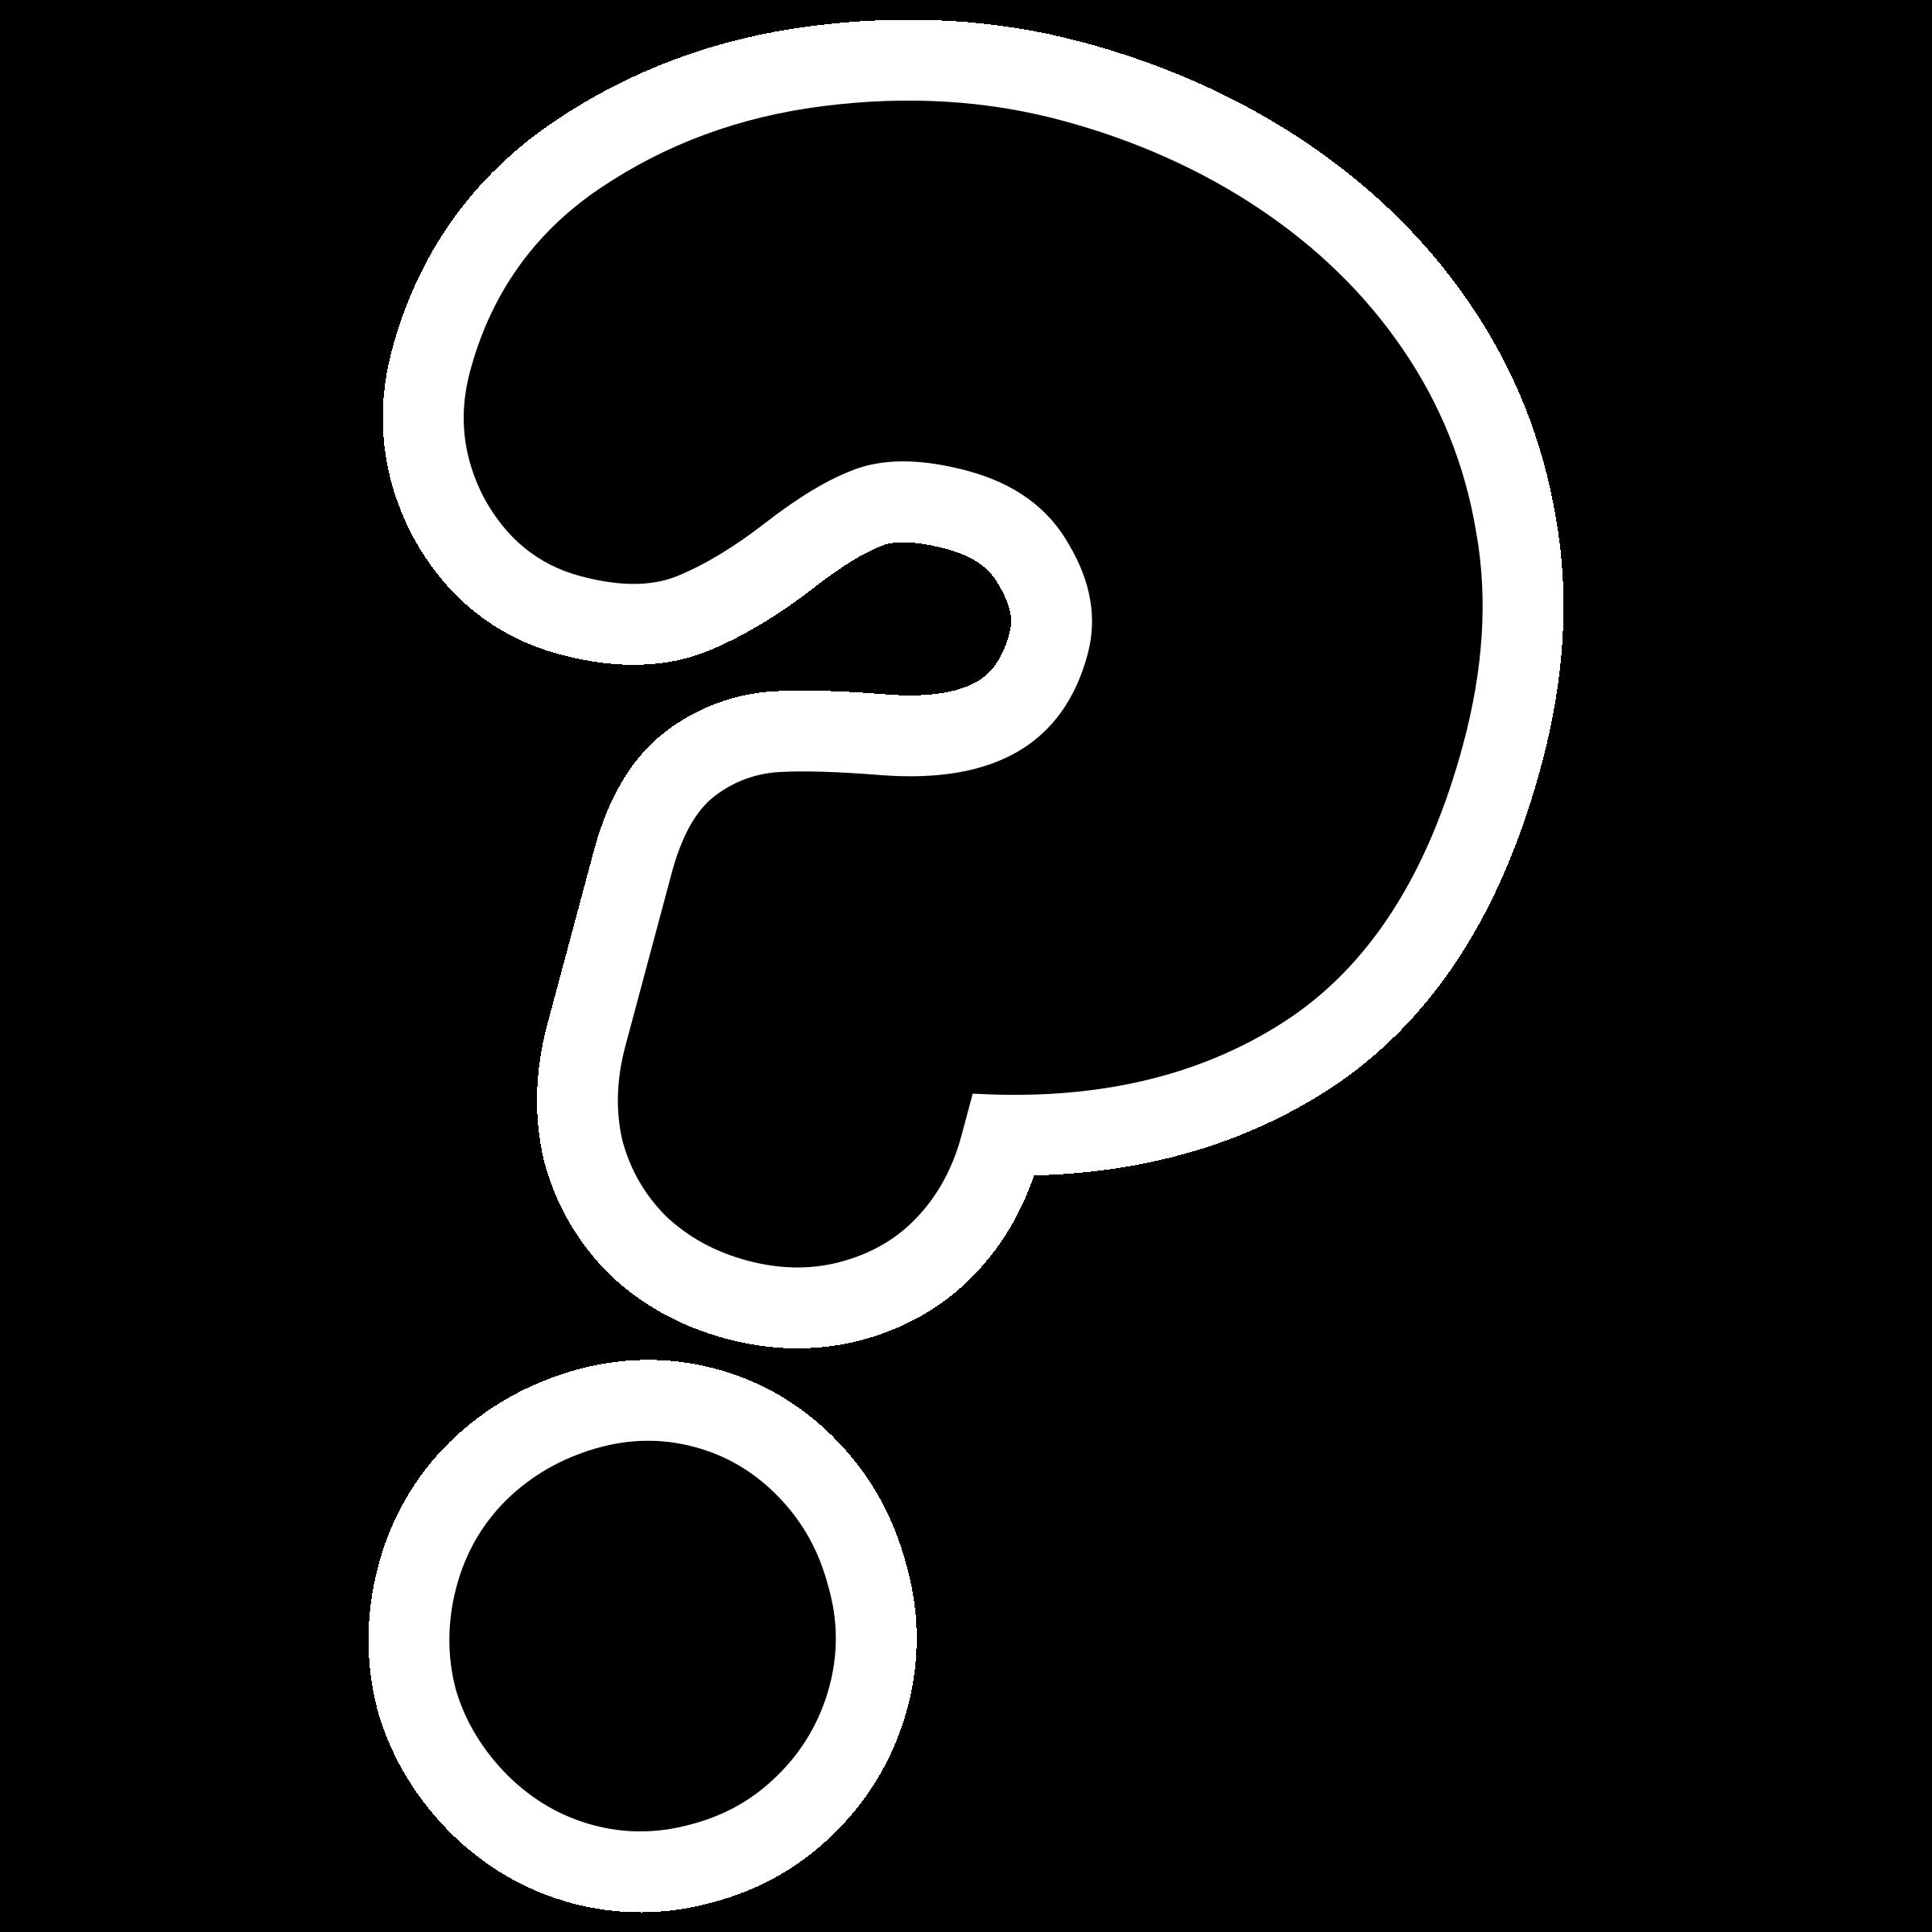 Question Mark Clipart & Question Mark Clip Art Images.